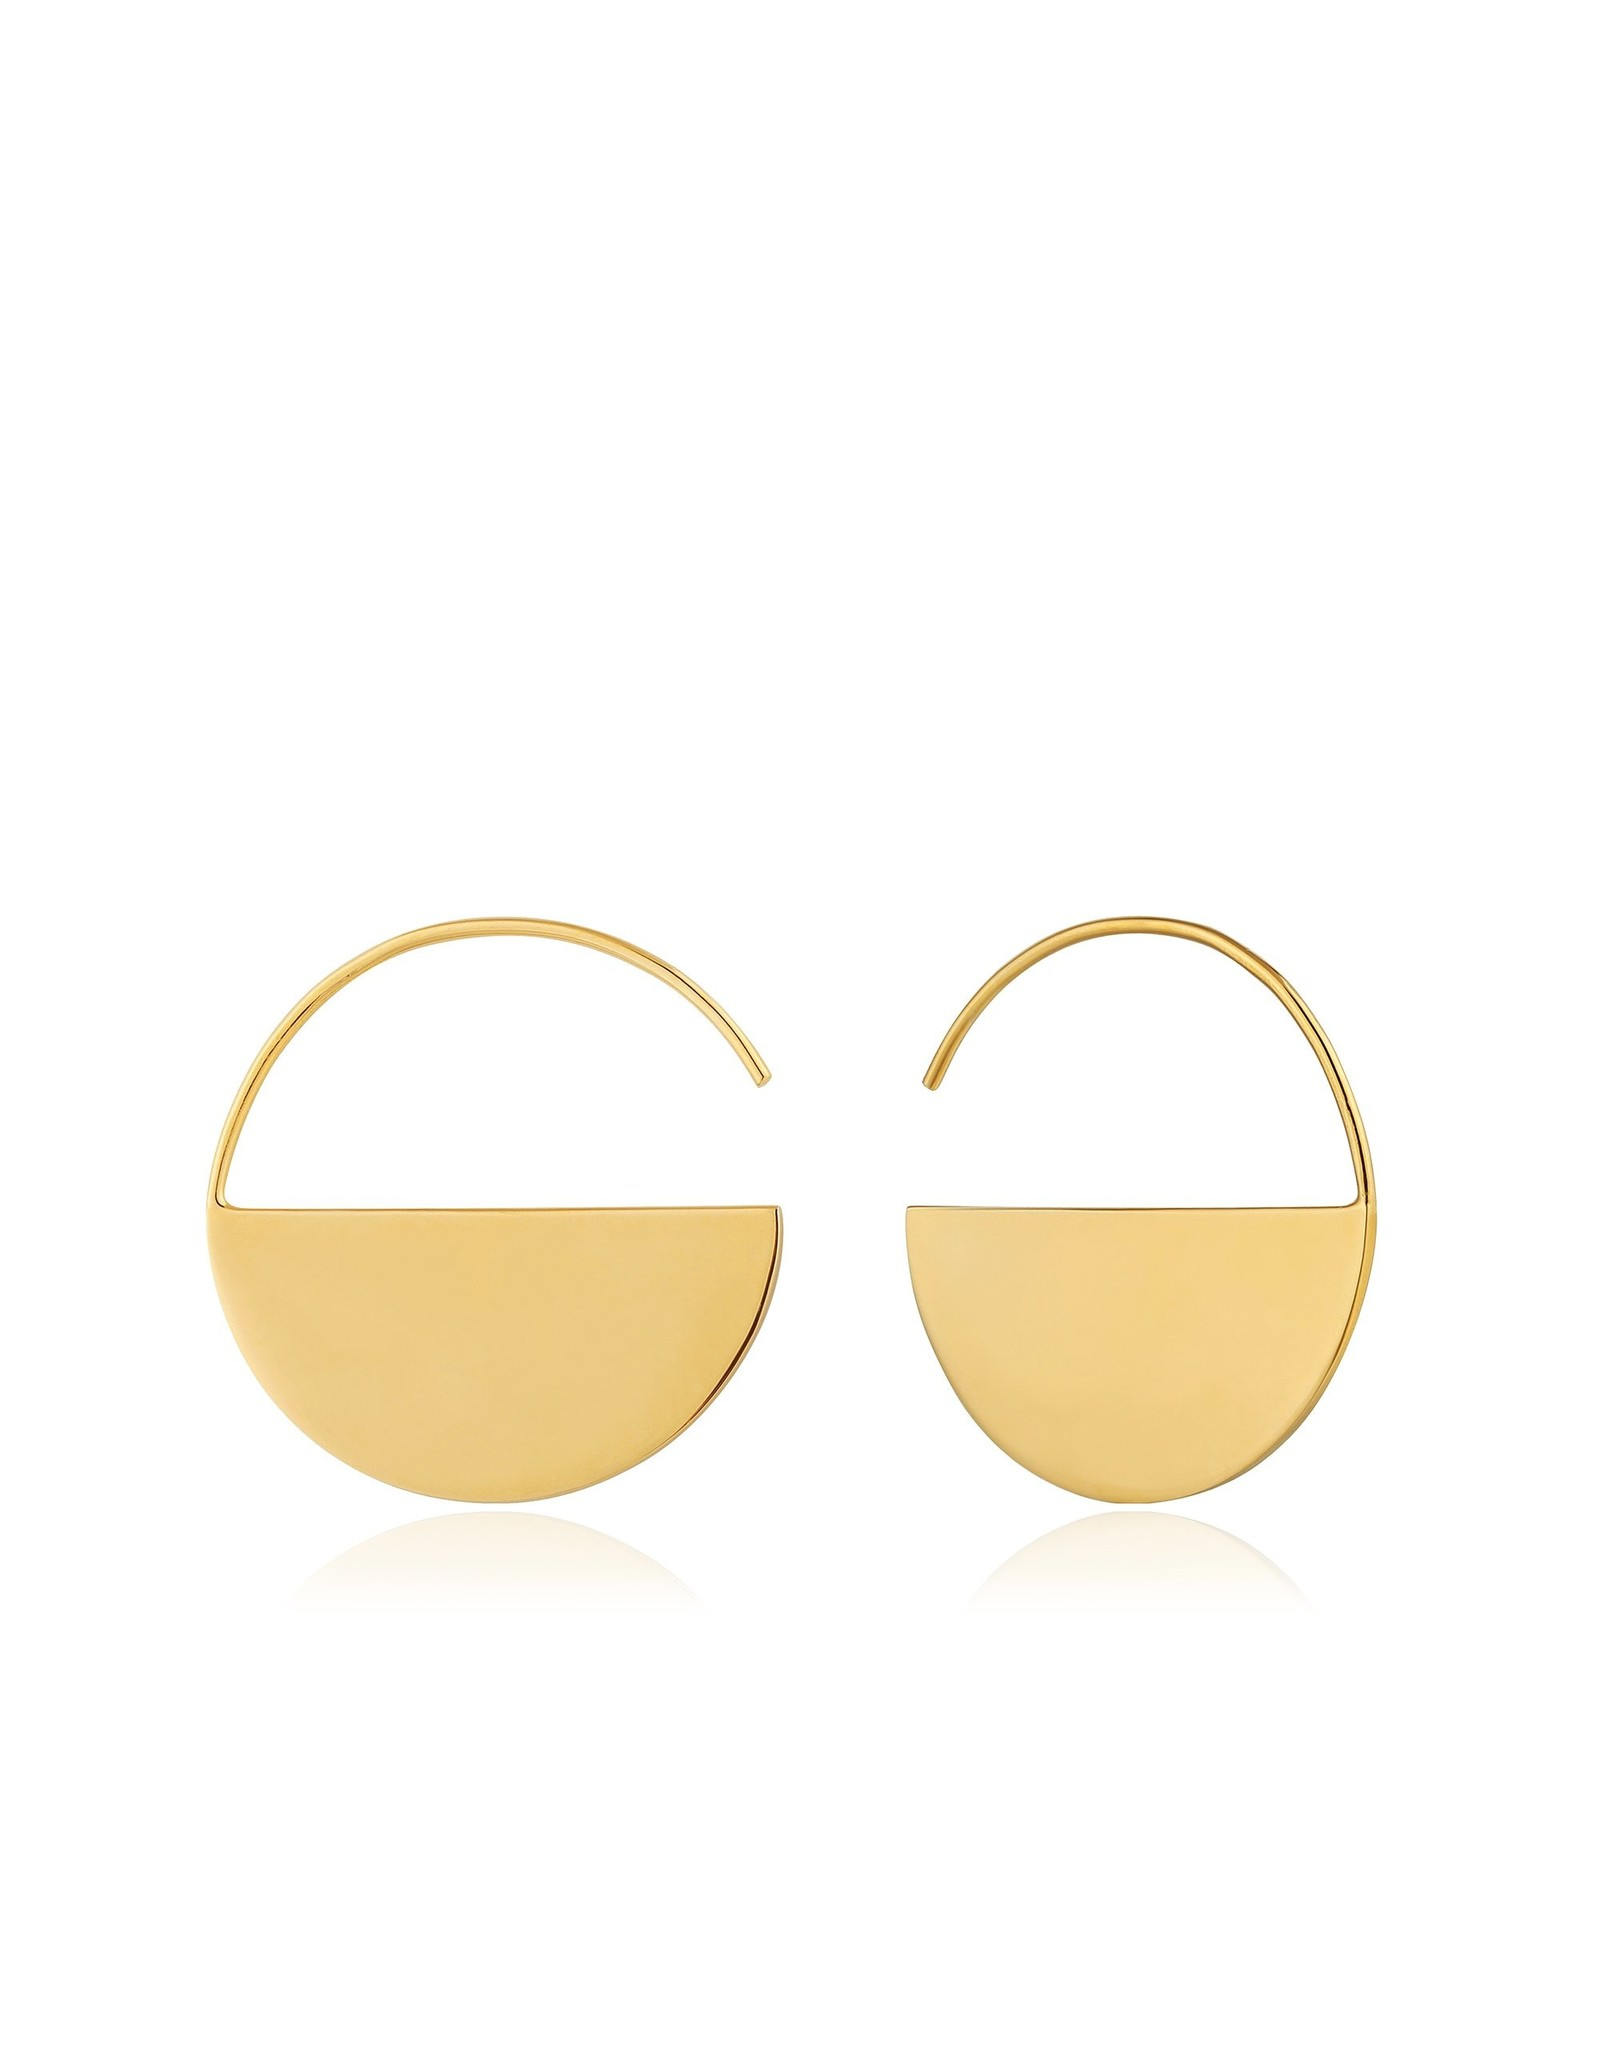 Ania Haie Geometry Hoop E/R, Gold